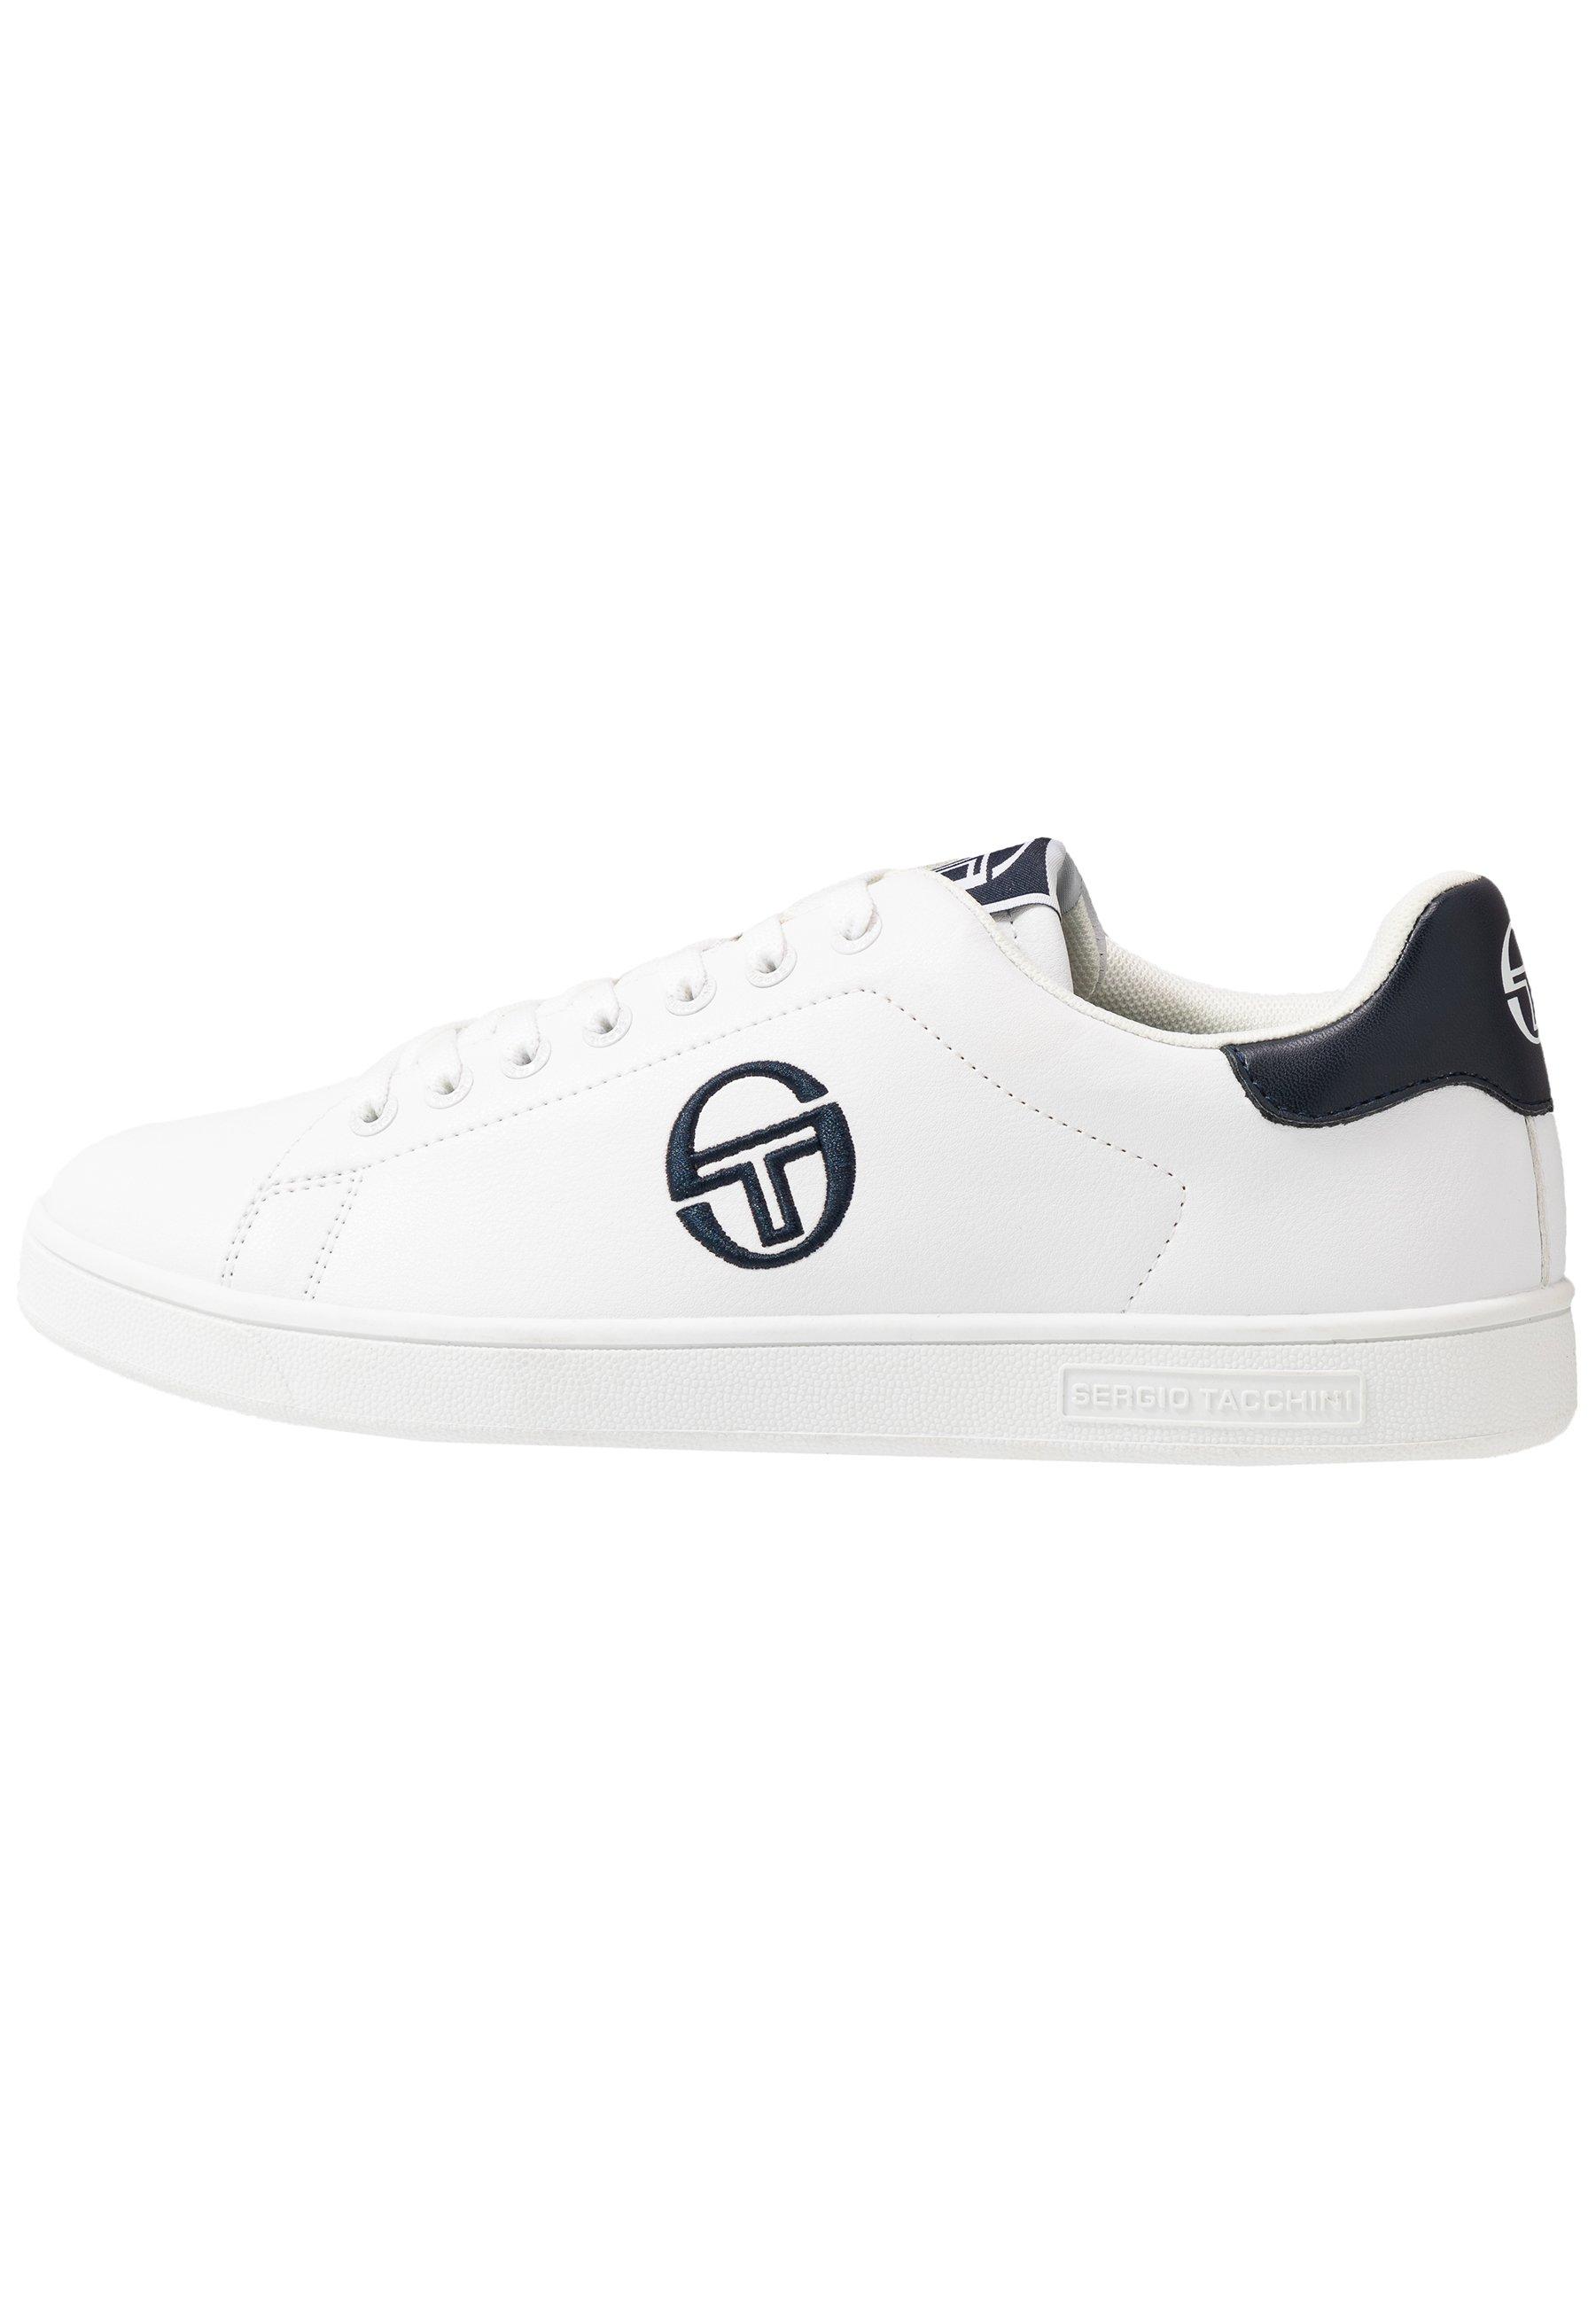 GRAN TORINO Sneakers whitenavy